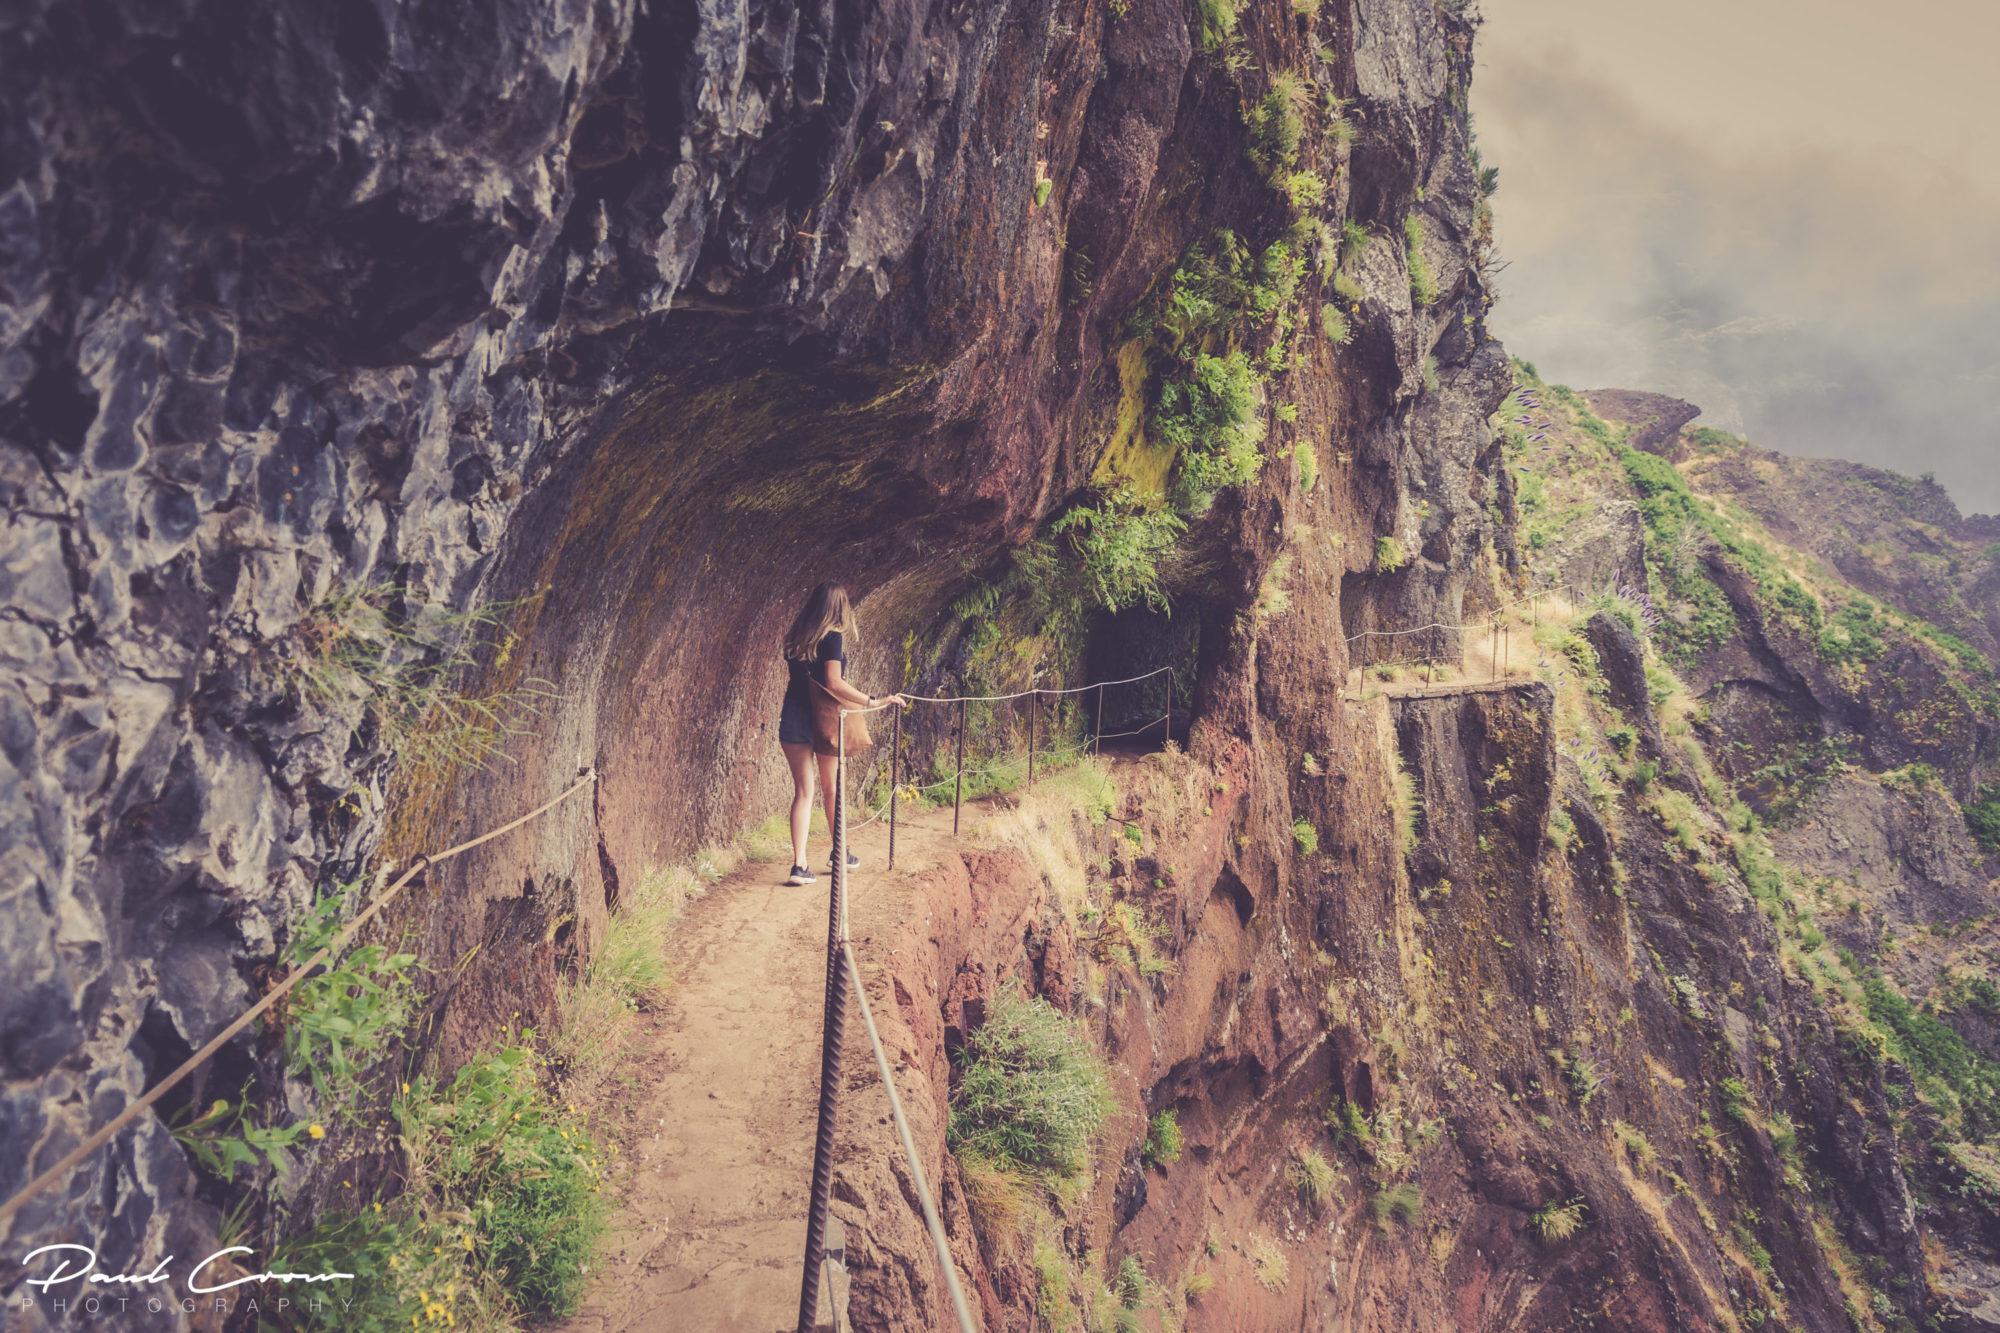 Walking the Pico Arieiro to Pico Ruivo path